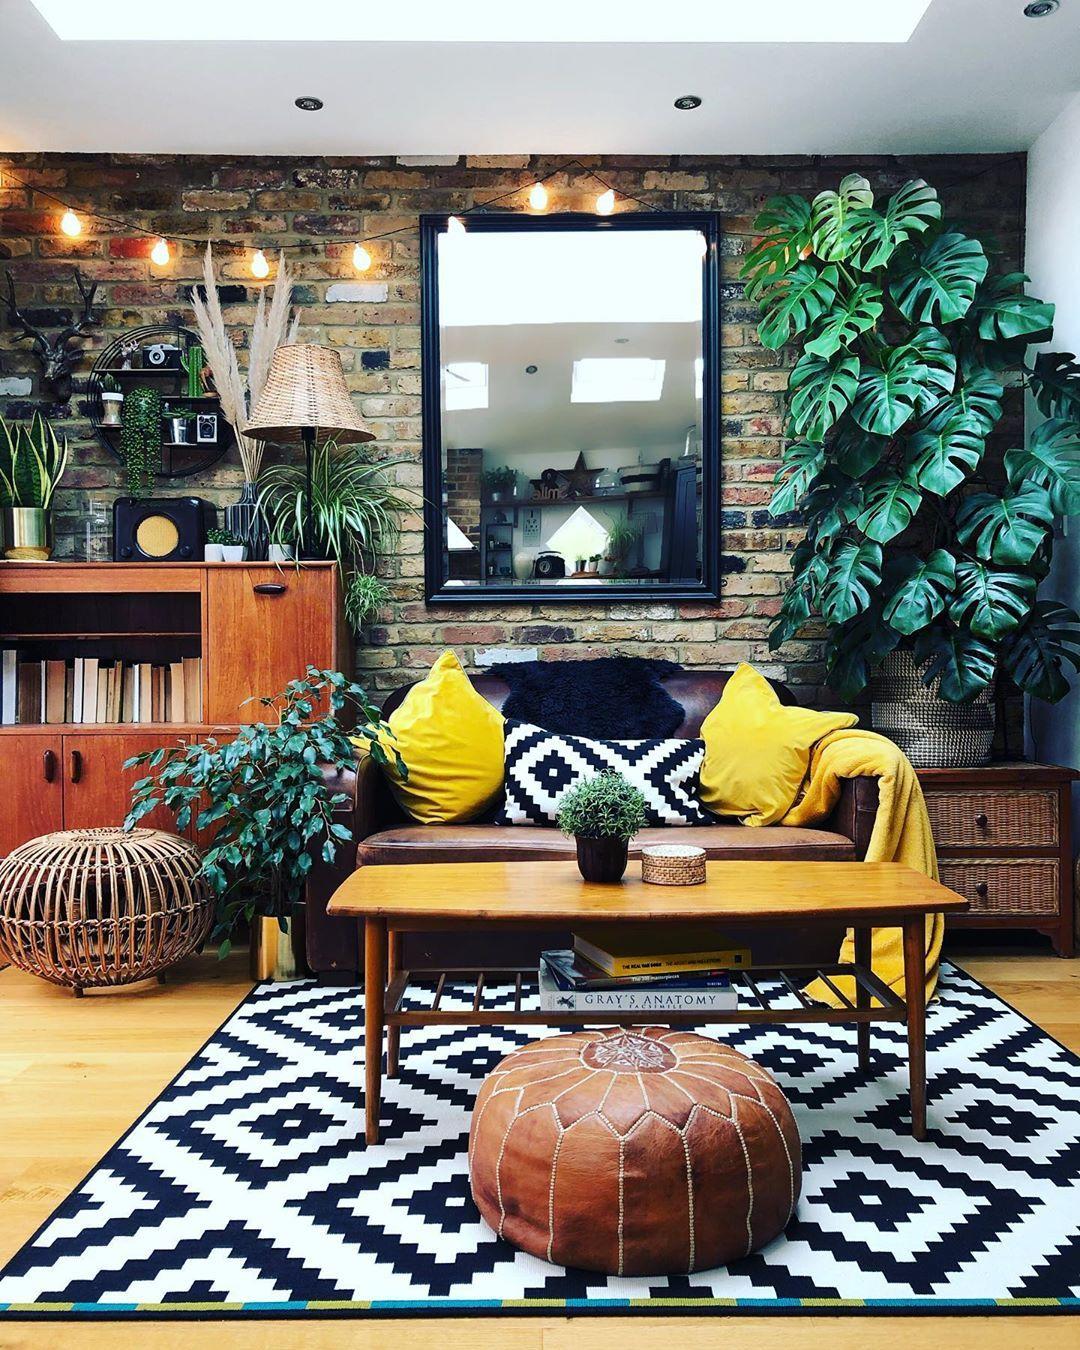 Mustard Meets Monochrome Bungalow 50 Homedecor Colorfulhome Colorfuldecor Livingroom Monochrome Home Decor House Interior House Design Color pop living room